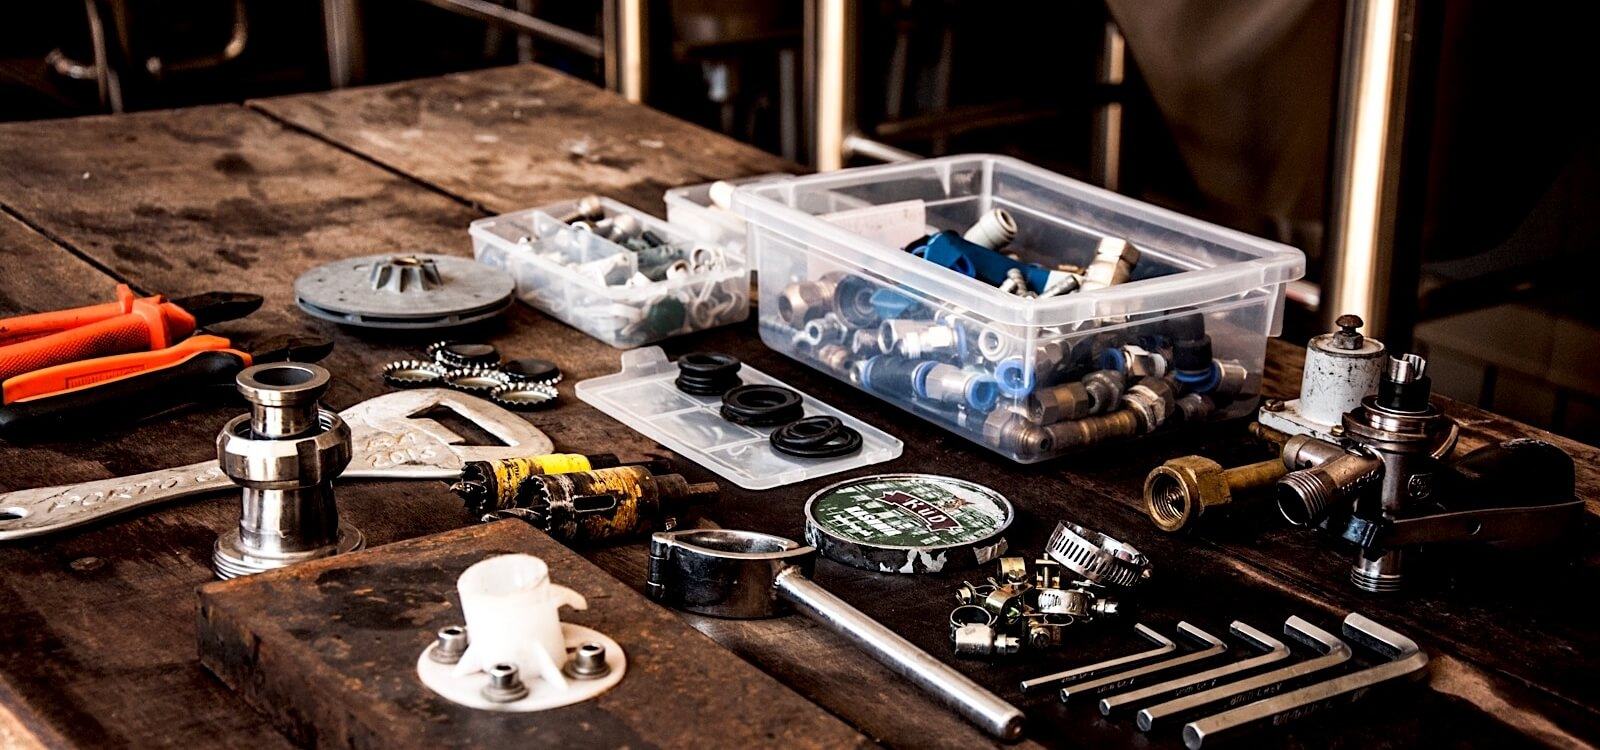 DIY Plumbing Tips 4